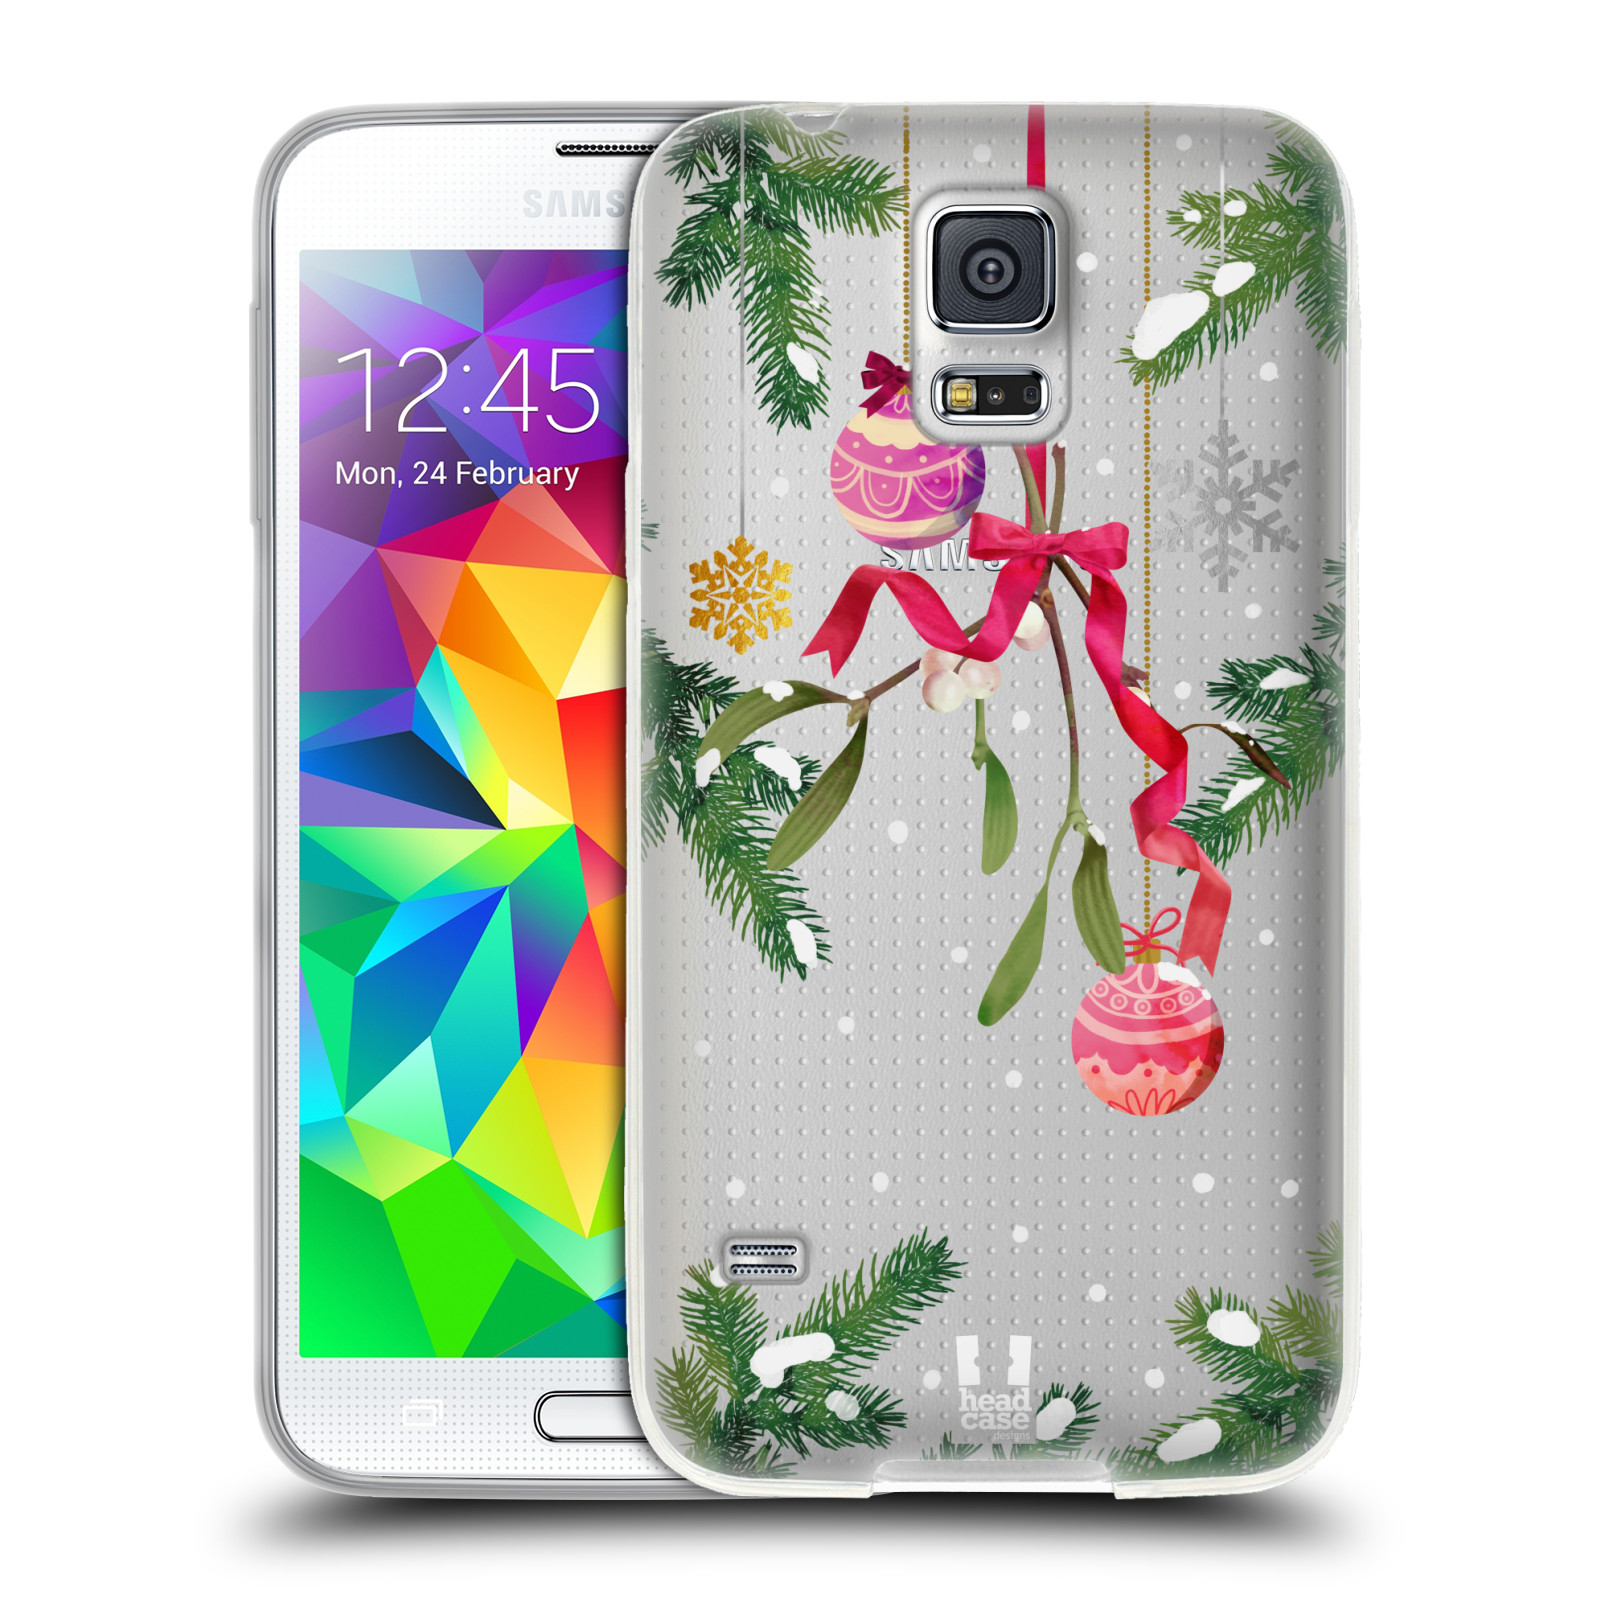 Silikonové pouzdro na mobil Samsung Galaxy S5 Neo - Head Case - Větvičky a vánoční ozdoby